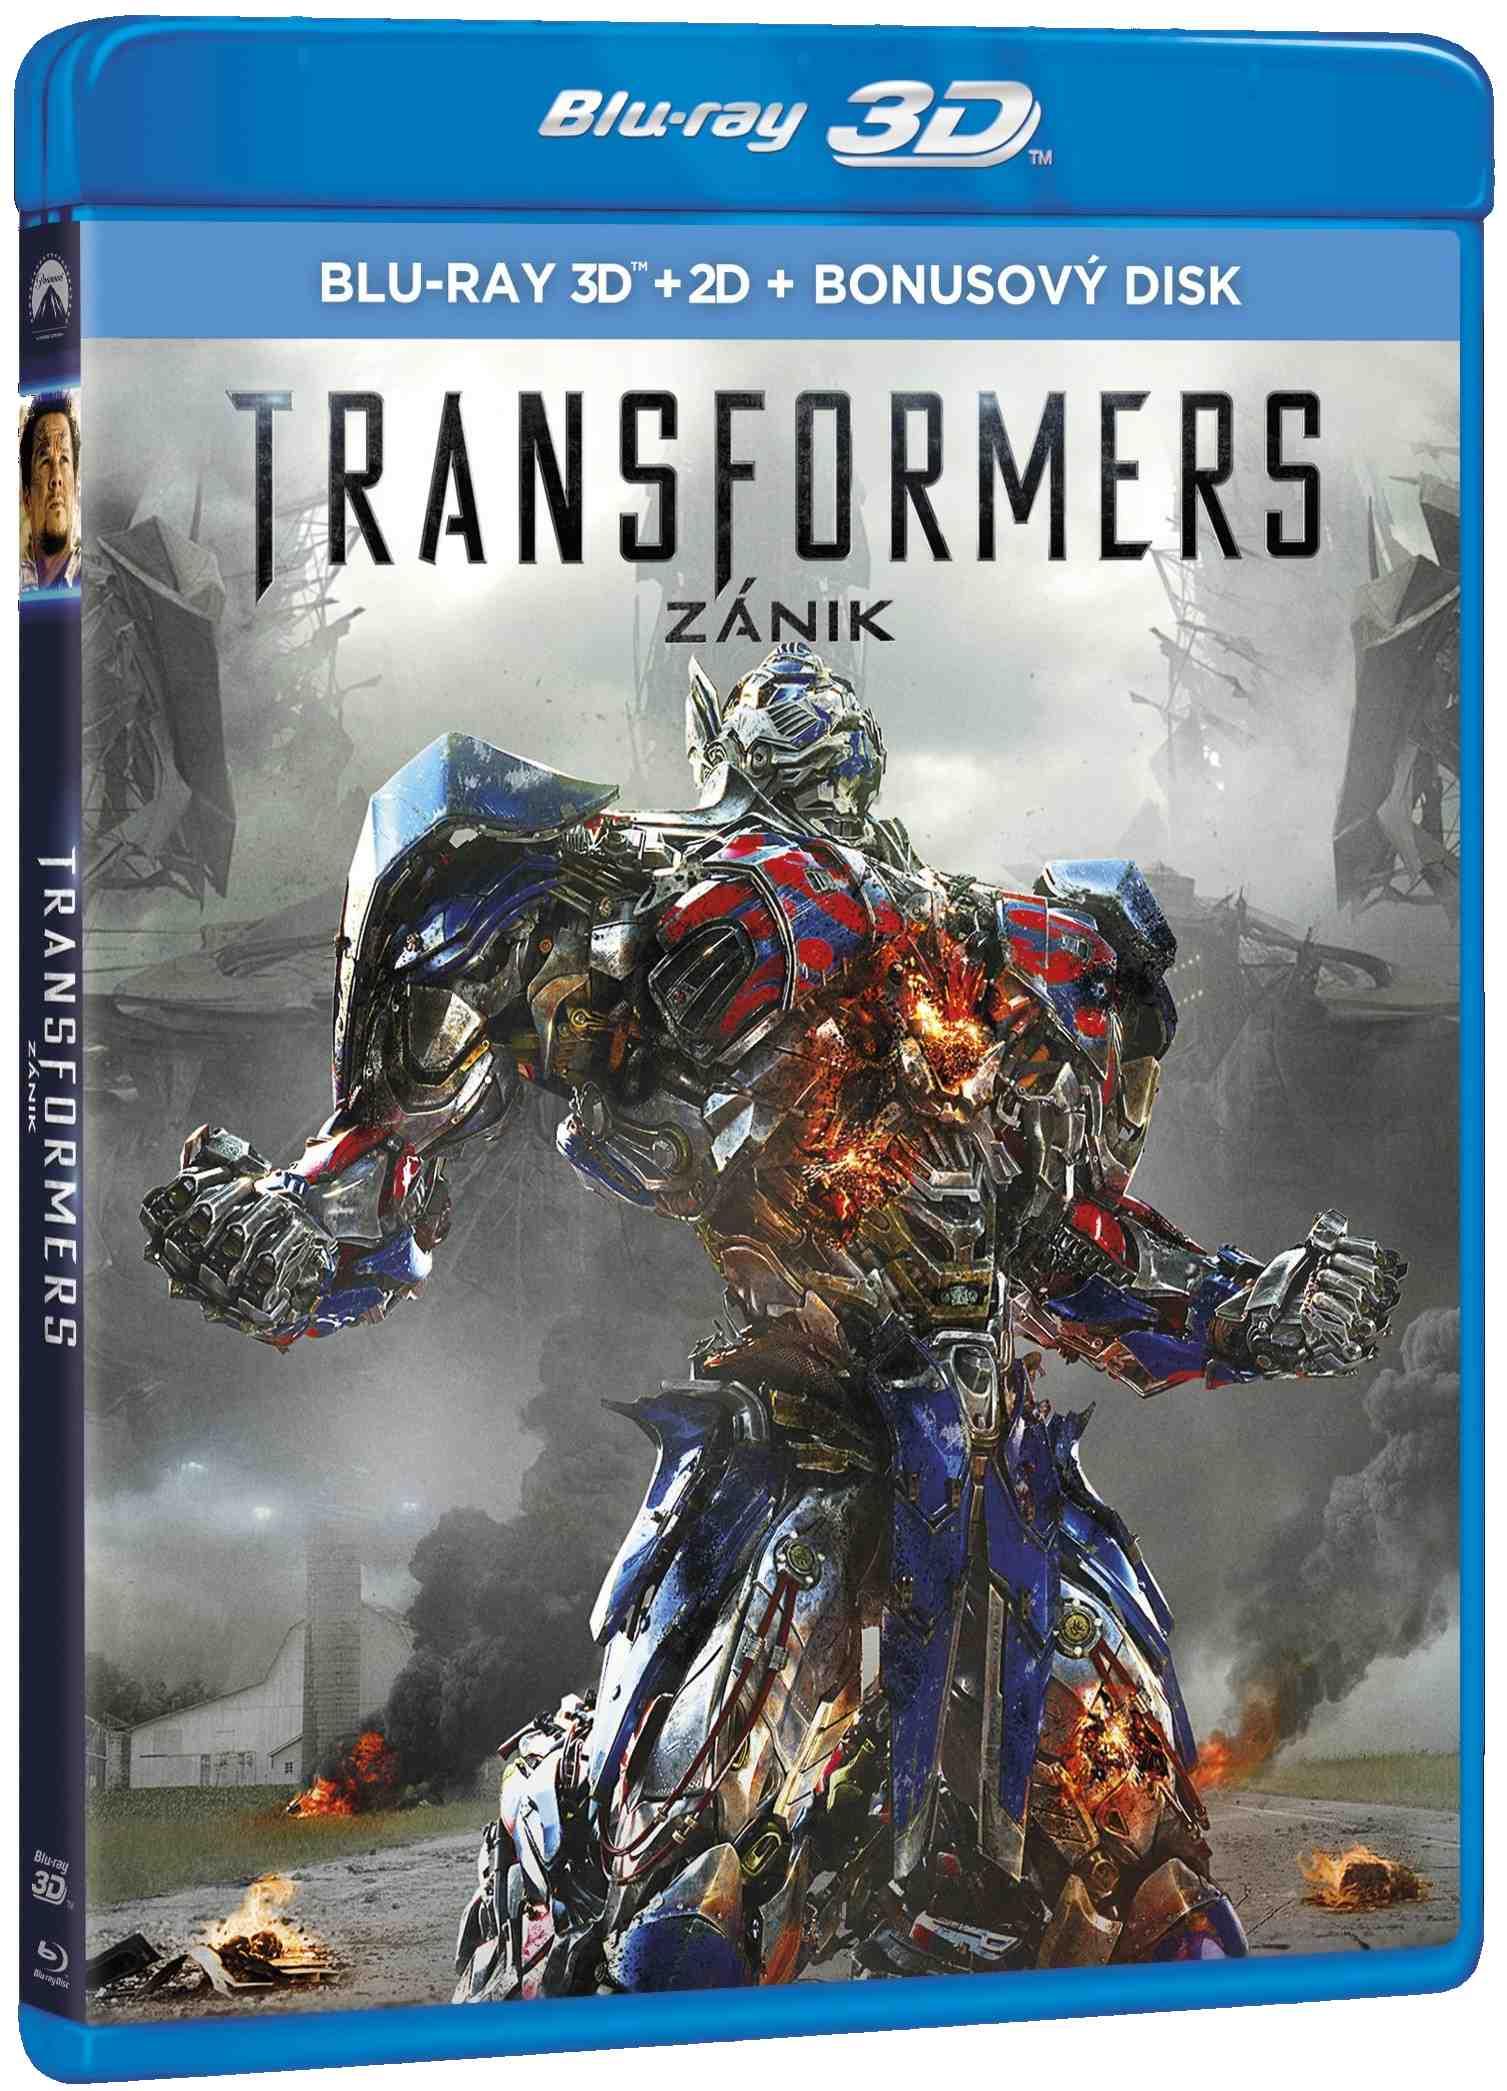 TRANSFORMERS 4: ZÁNIK - Blu-ray 3D + 2D + bonus BD